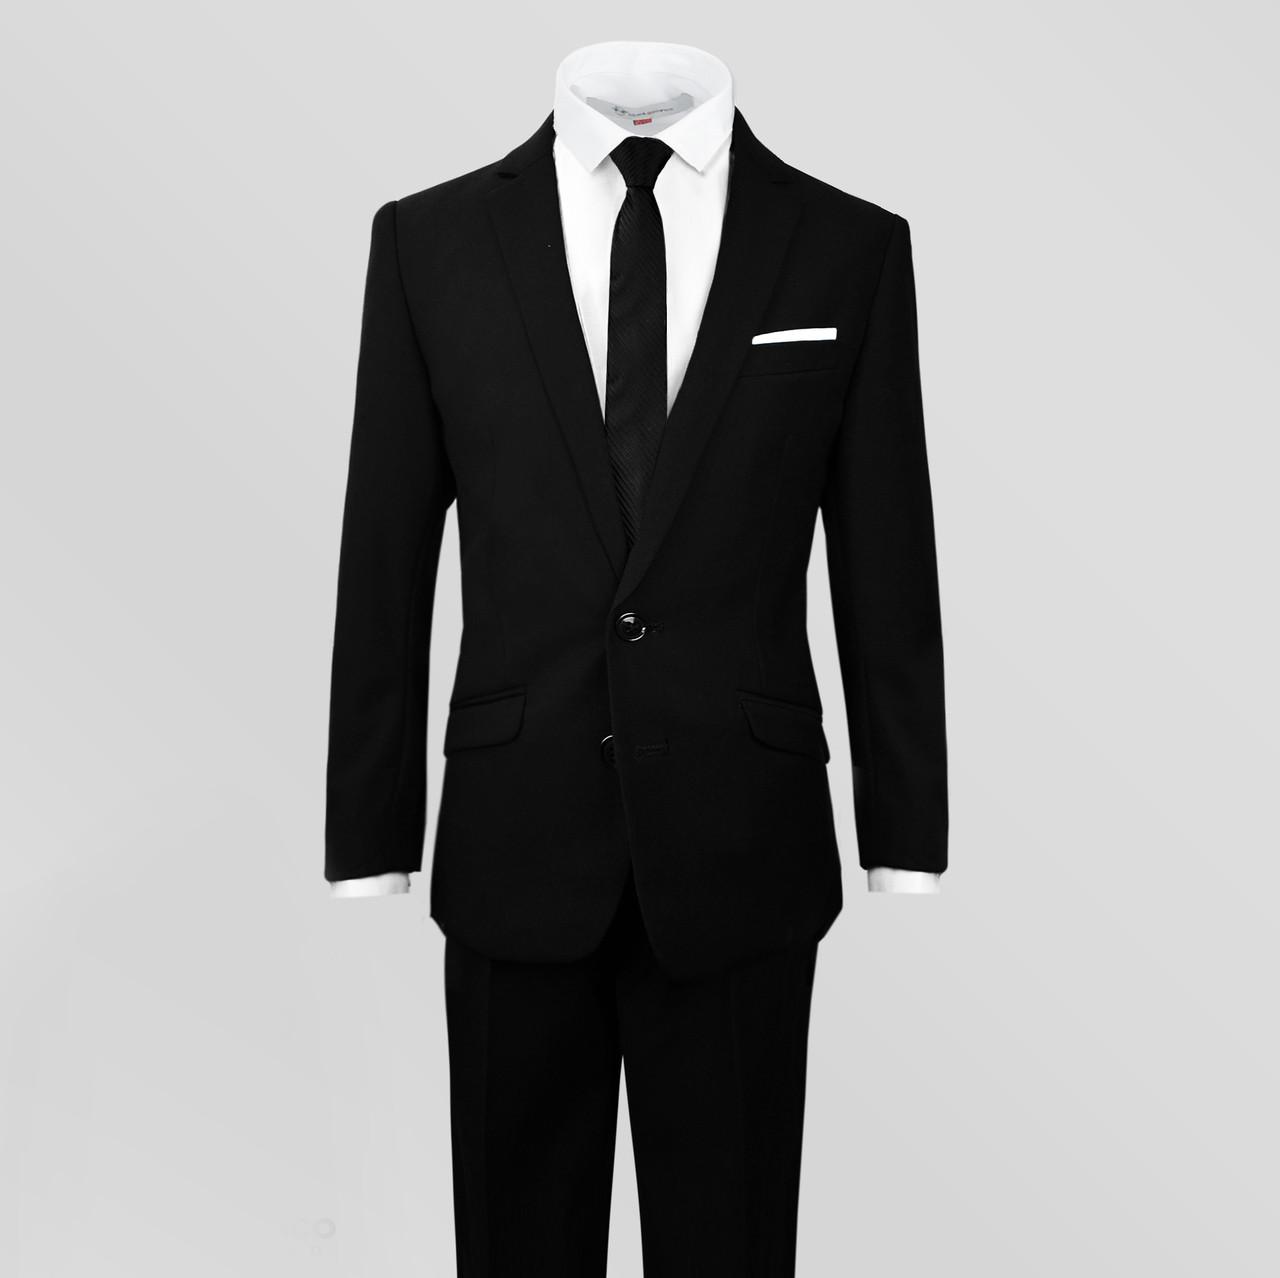 0f44c3b72 Boys Black Suit Slim Fit Dresswear Outwear Set - BLACK N BIANCO